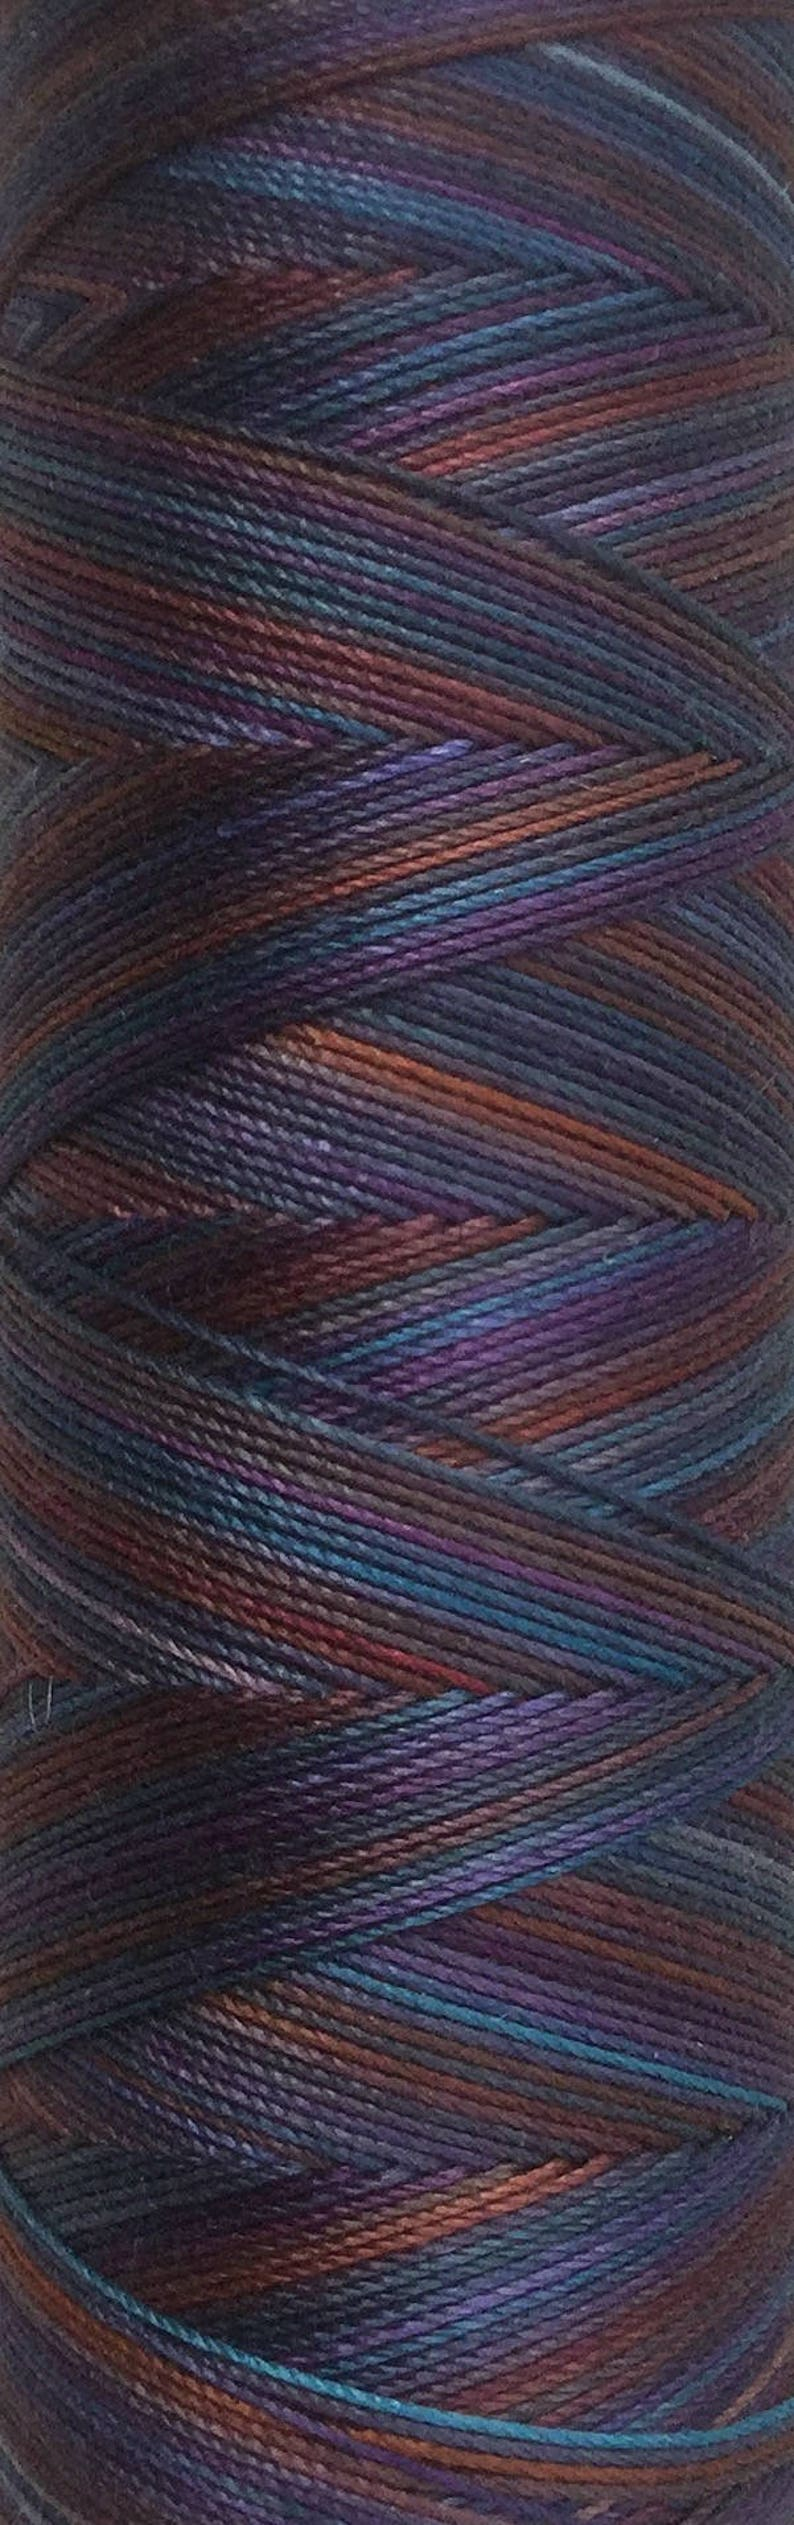 No.19 Black Cherry Hand Dyed Cotton Machine Thread image 0